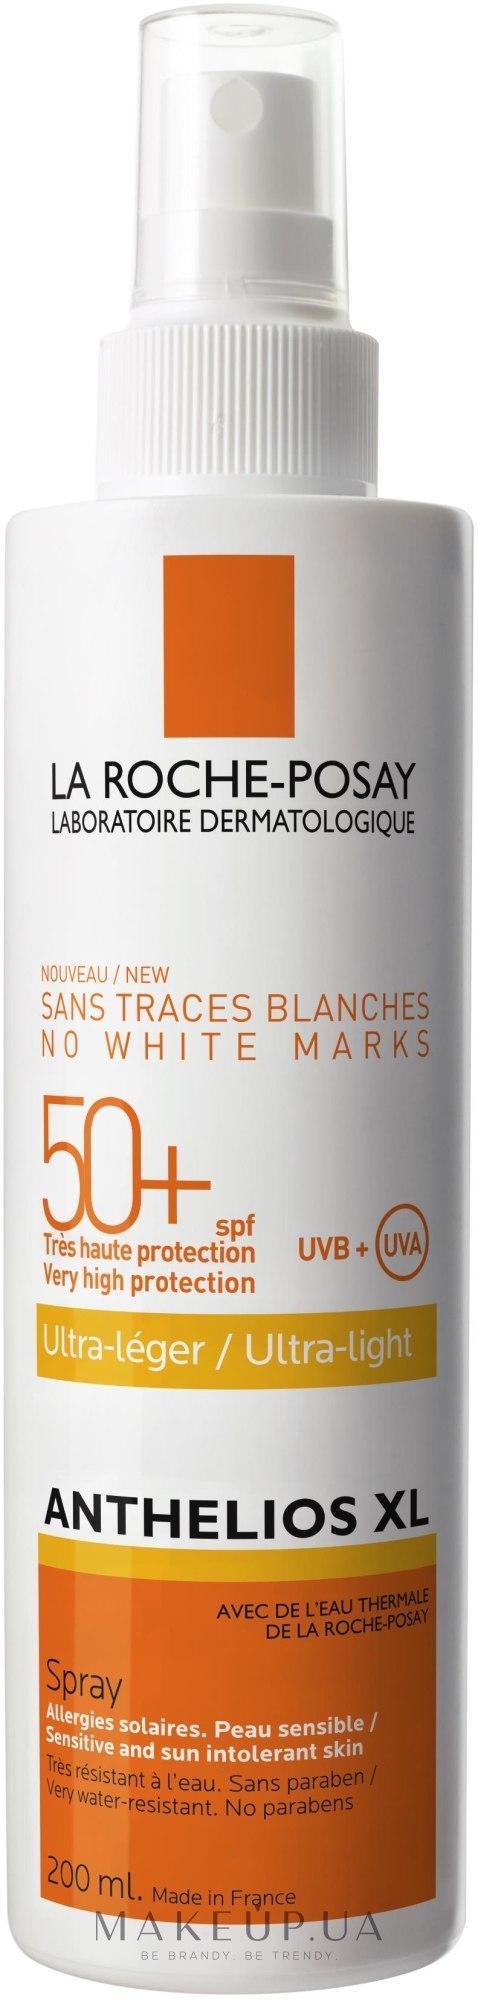 Солнцезащитное средство для лица и тела (La Roche-Posay Anthelios Xl Ultra-light SPF 50+)